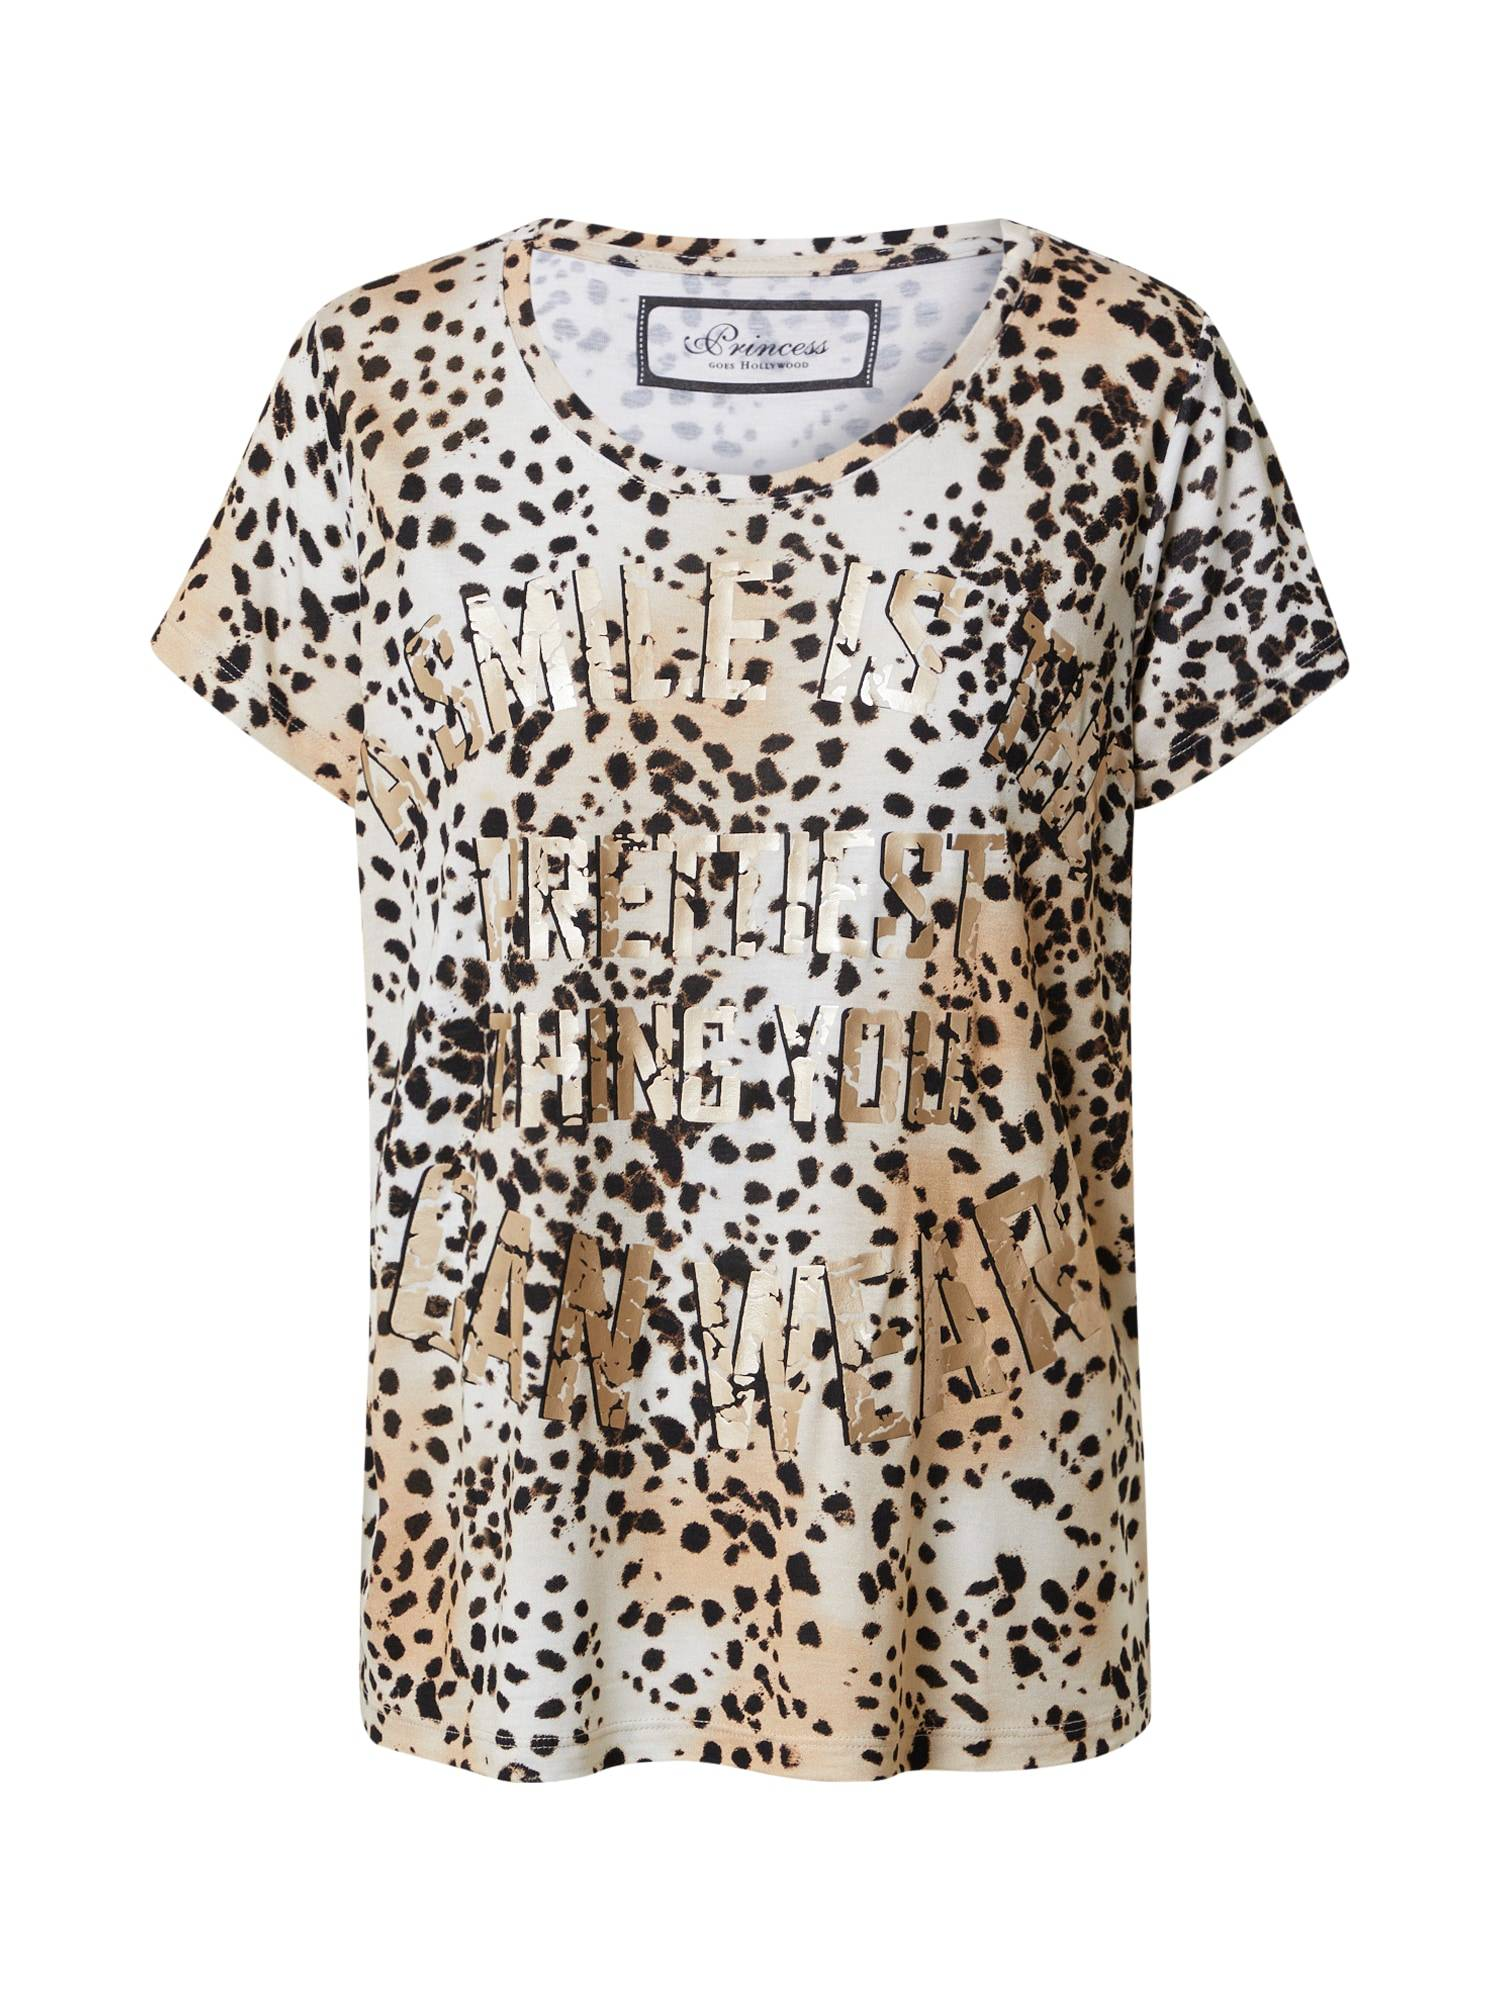 Princess T-shirt  - Beige - Taille: 38 - female